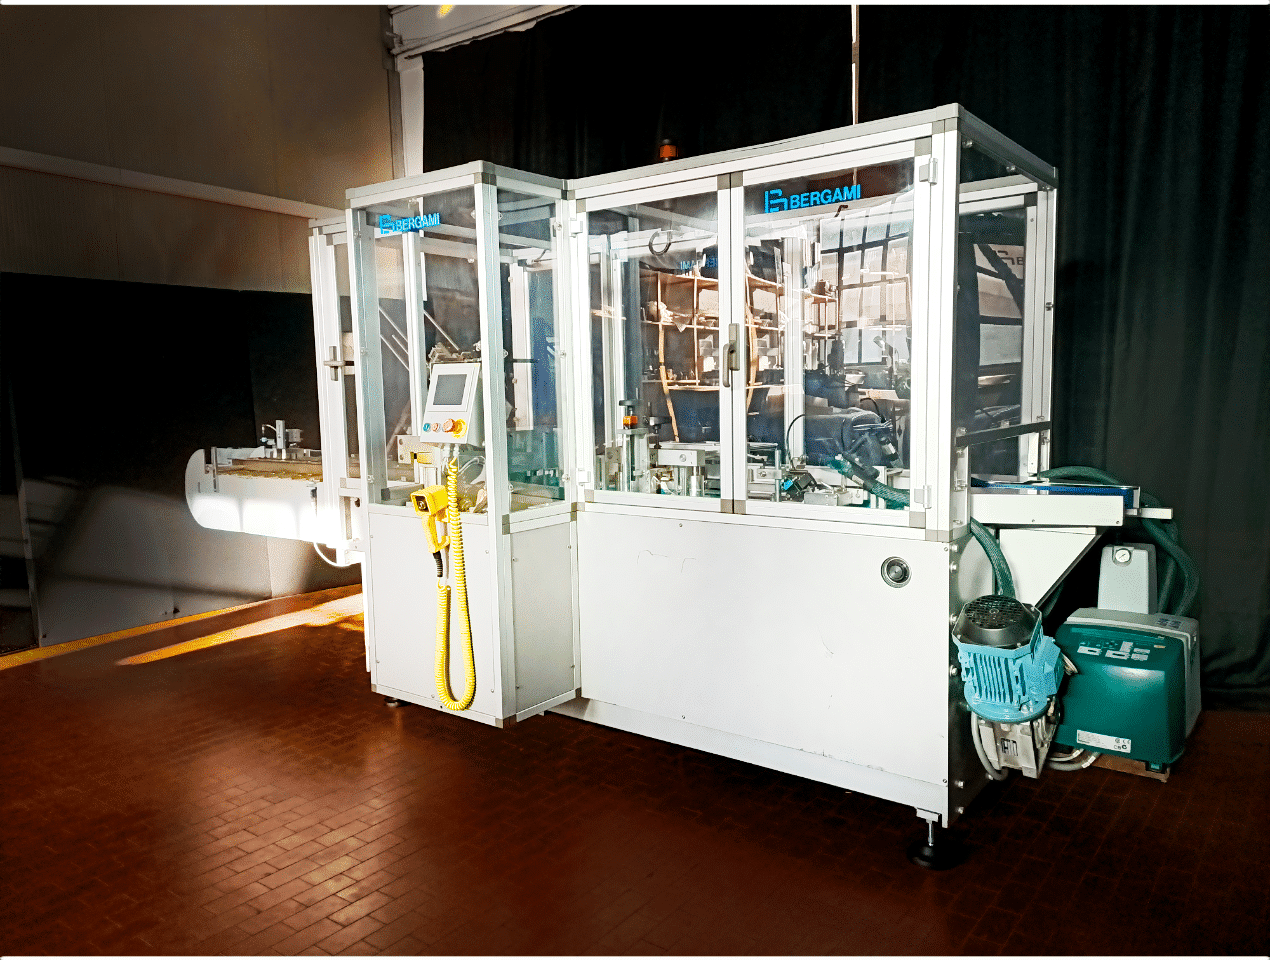 Astucciatrice automatica orizzontale Bergami AS70 2